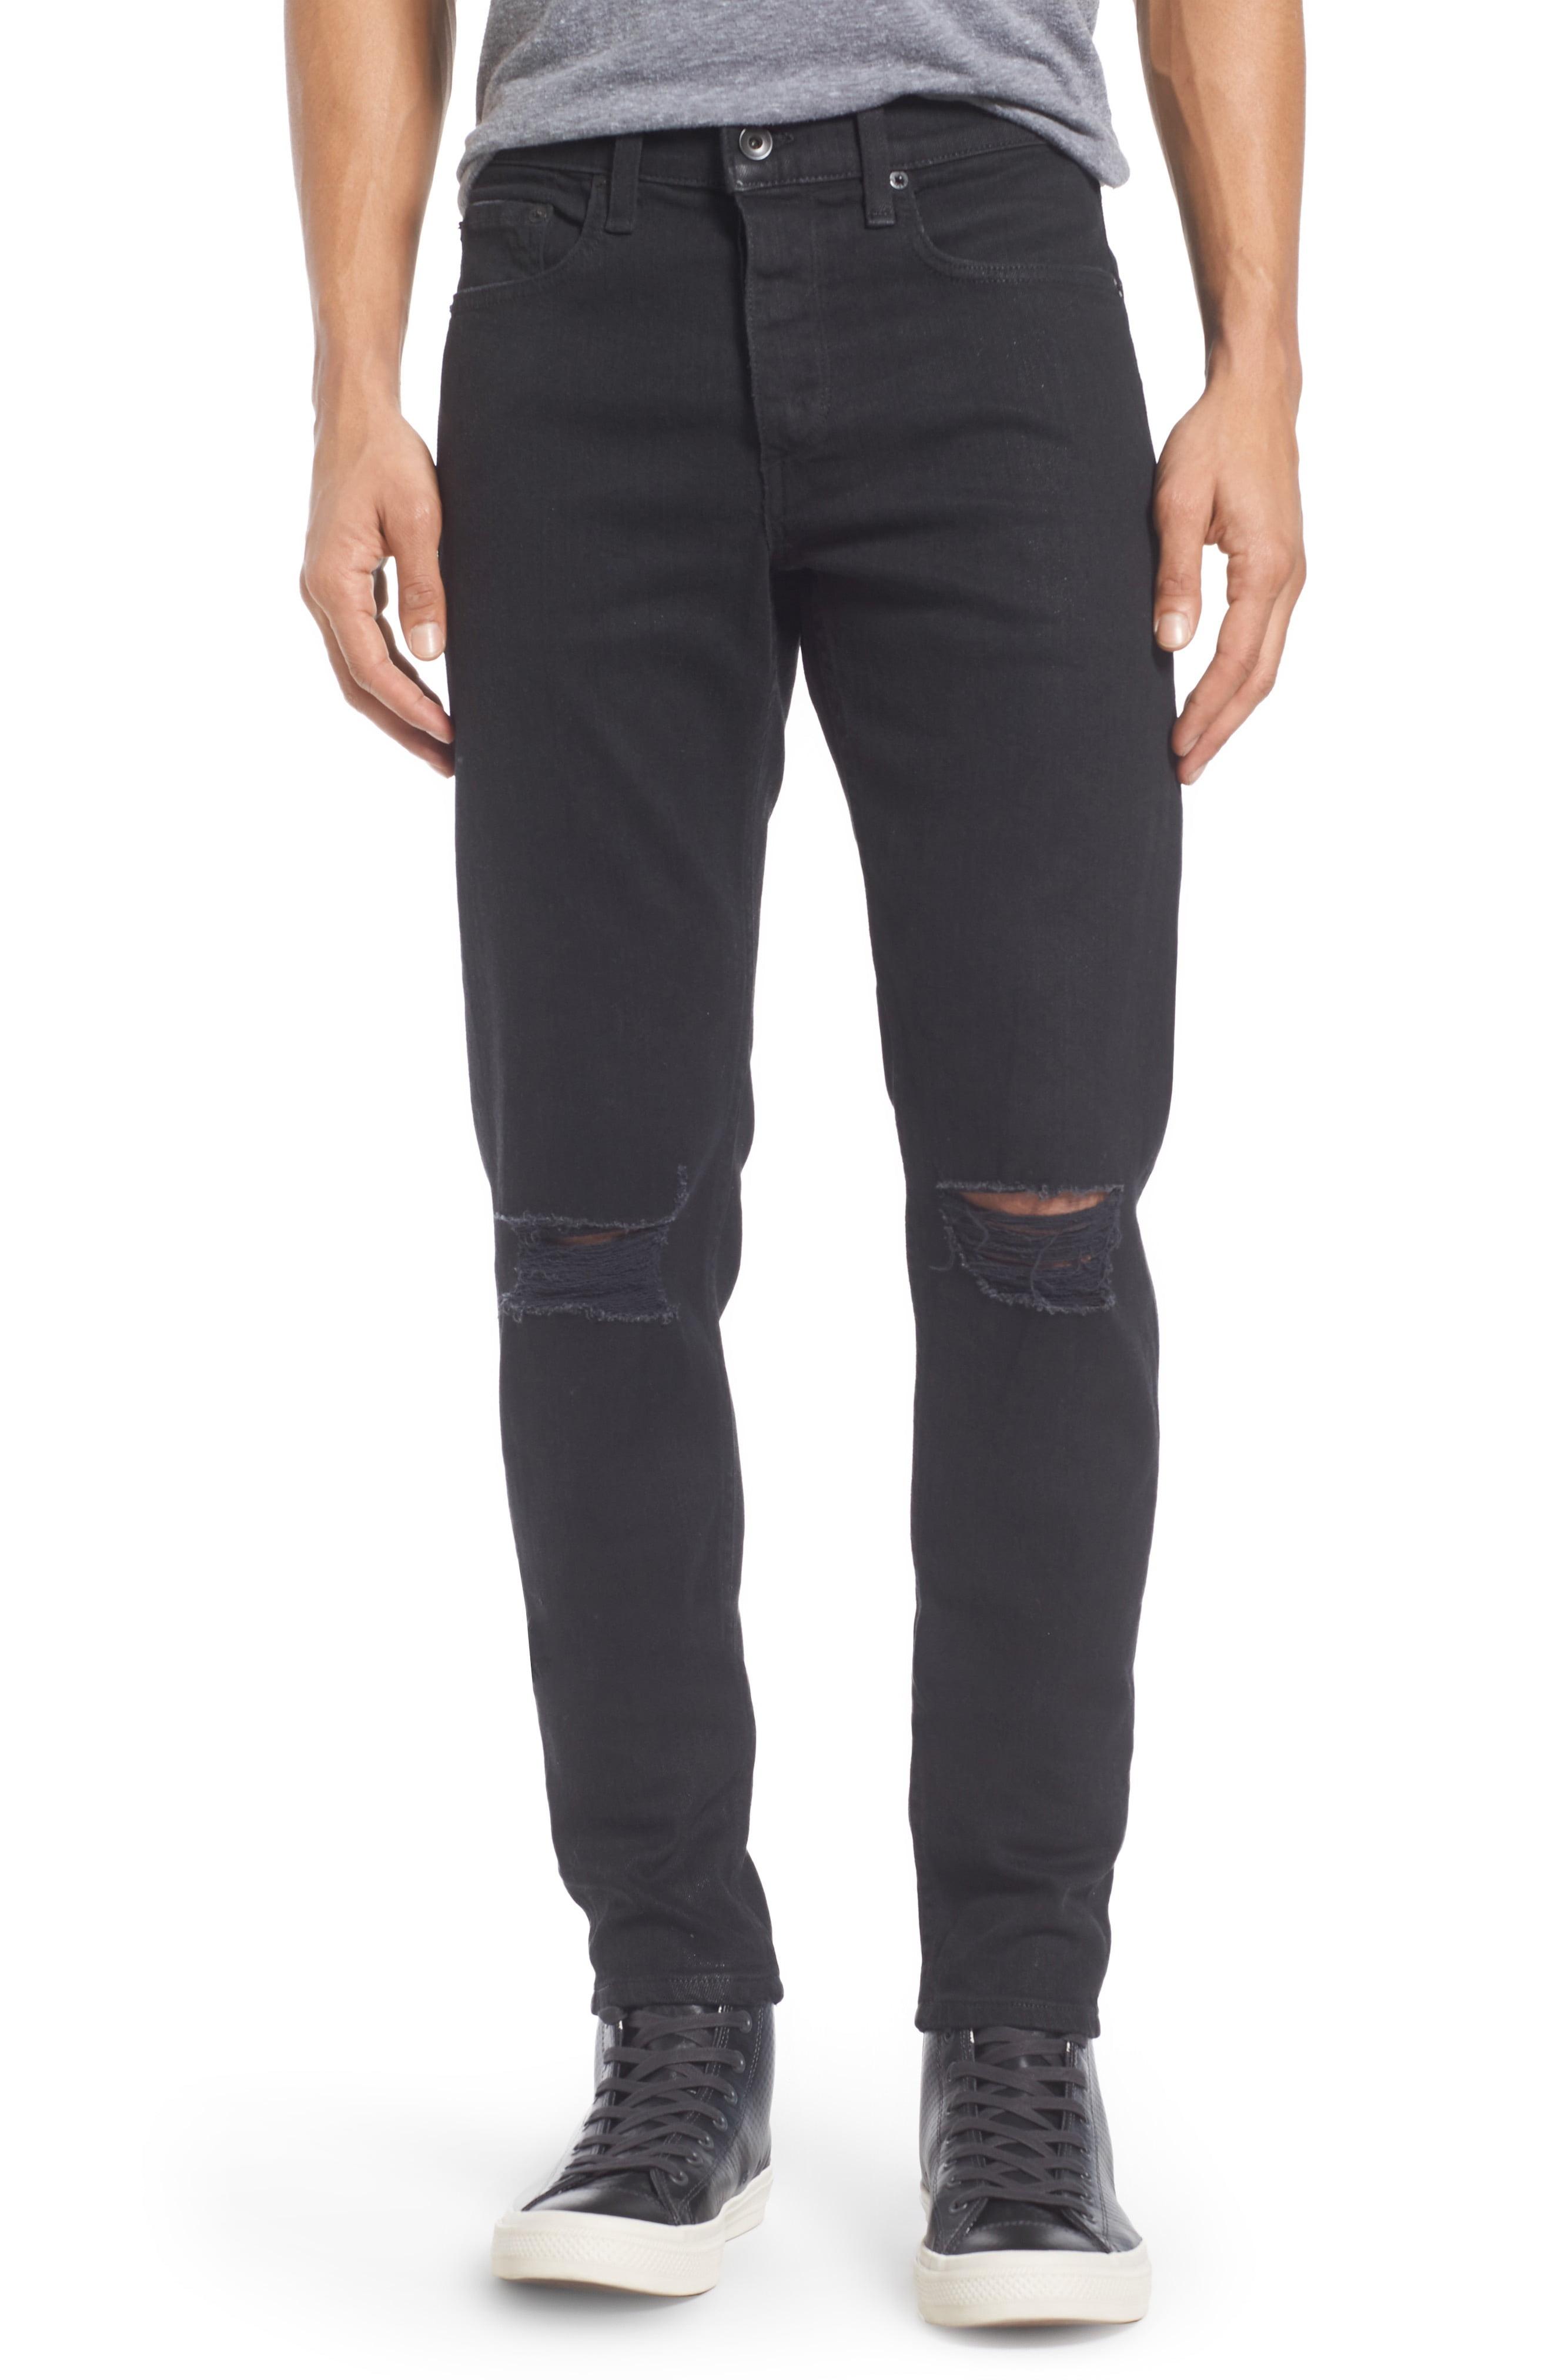 Men's Rag & Bone Fit 1 Skinny Fit Jeans, Size 28 - Black